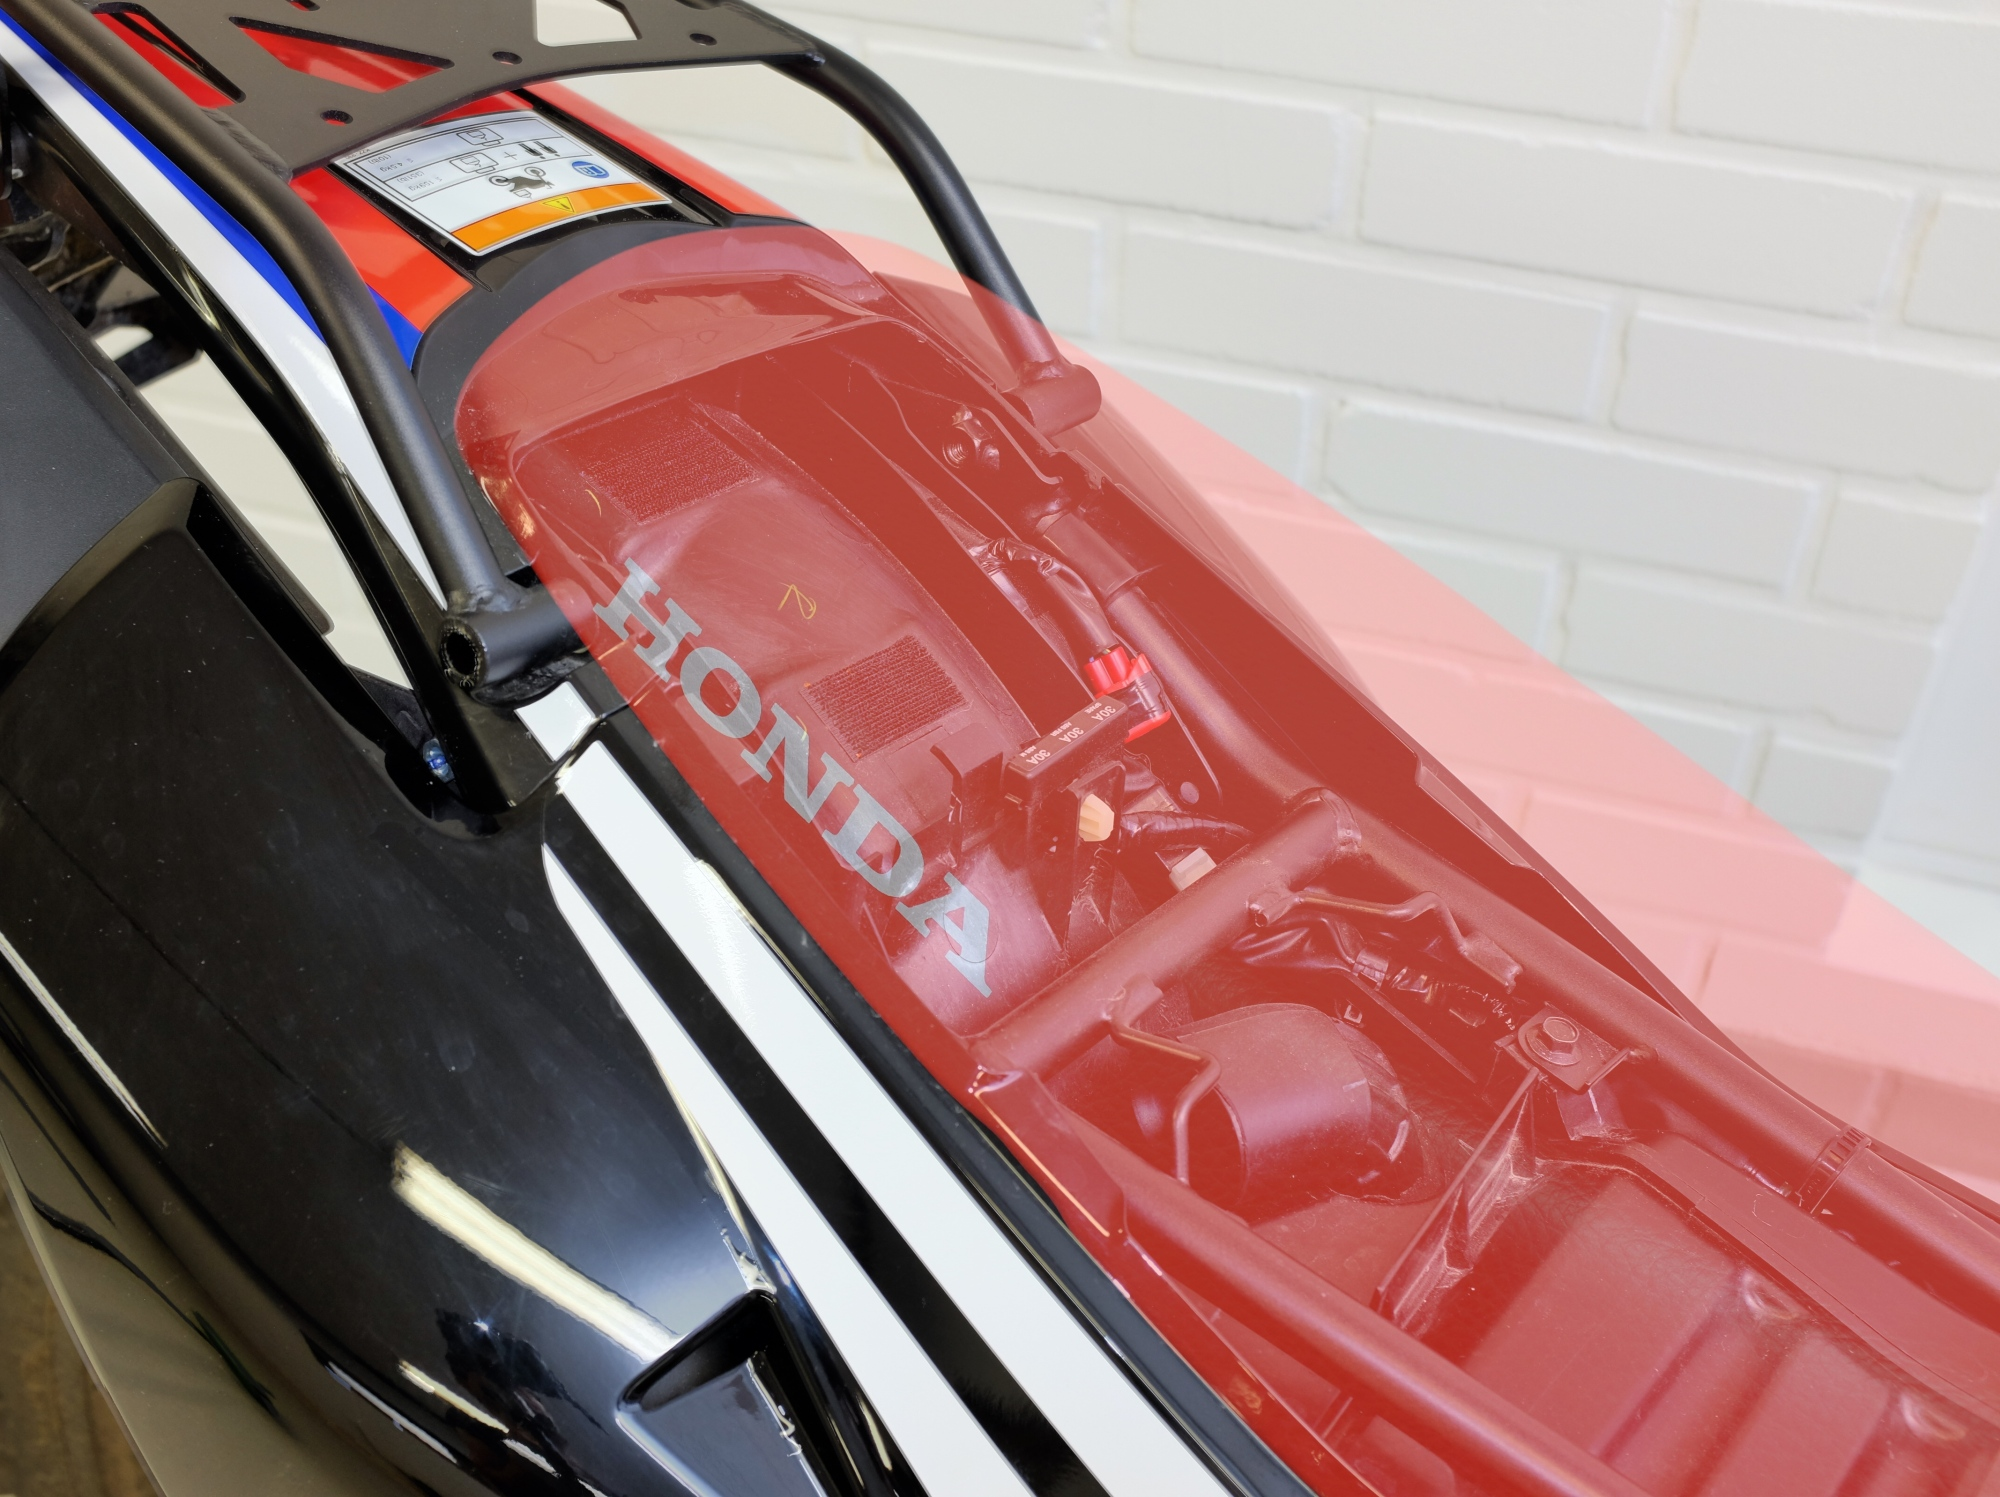 Honda 250 Rally Aux power source